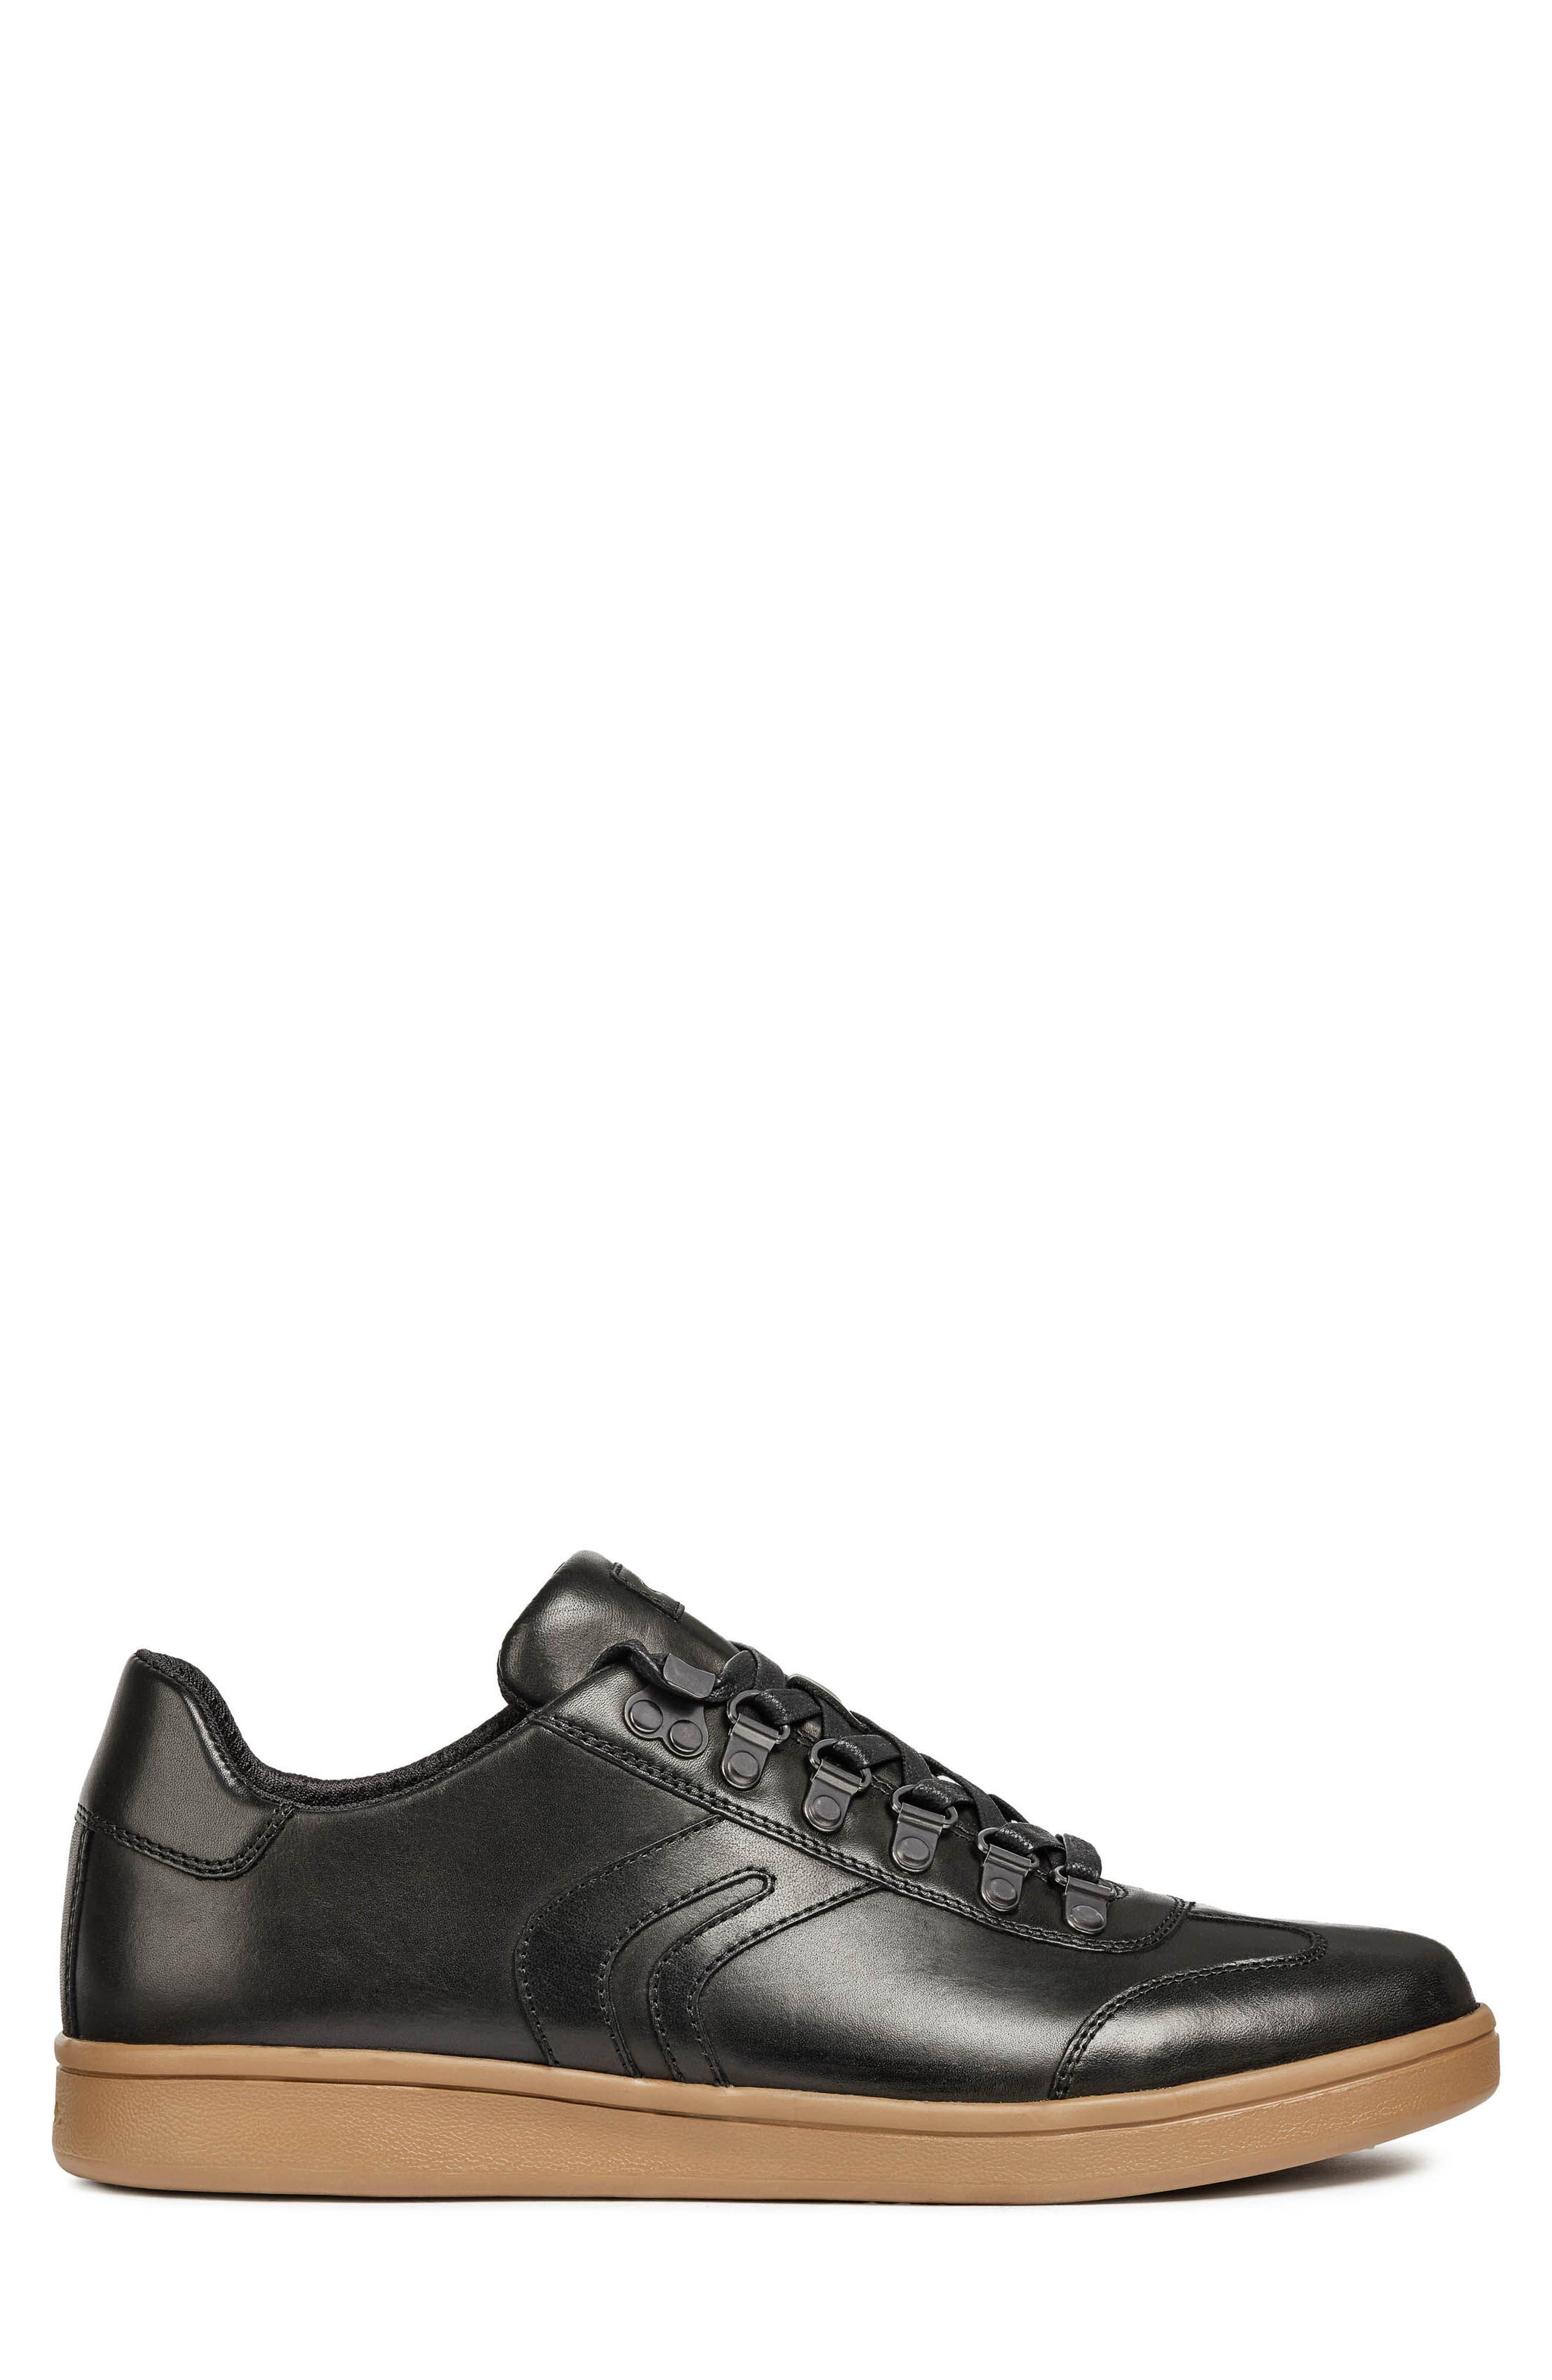 Warrens 12 Low Top Sneaker,                             Alternate thumbnail 3, color,                             BLACK LEATHER